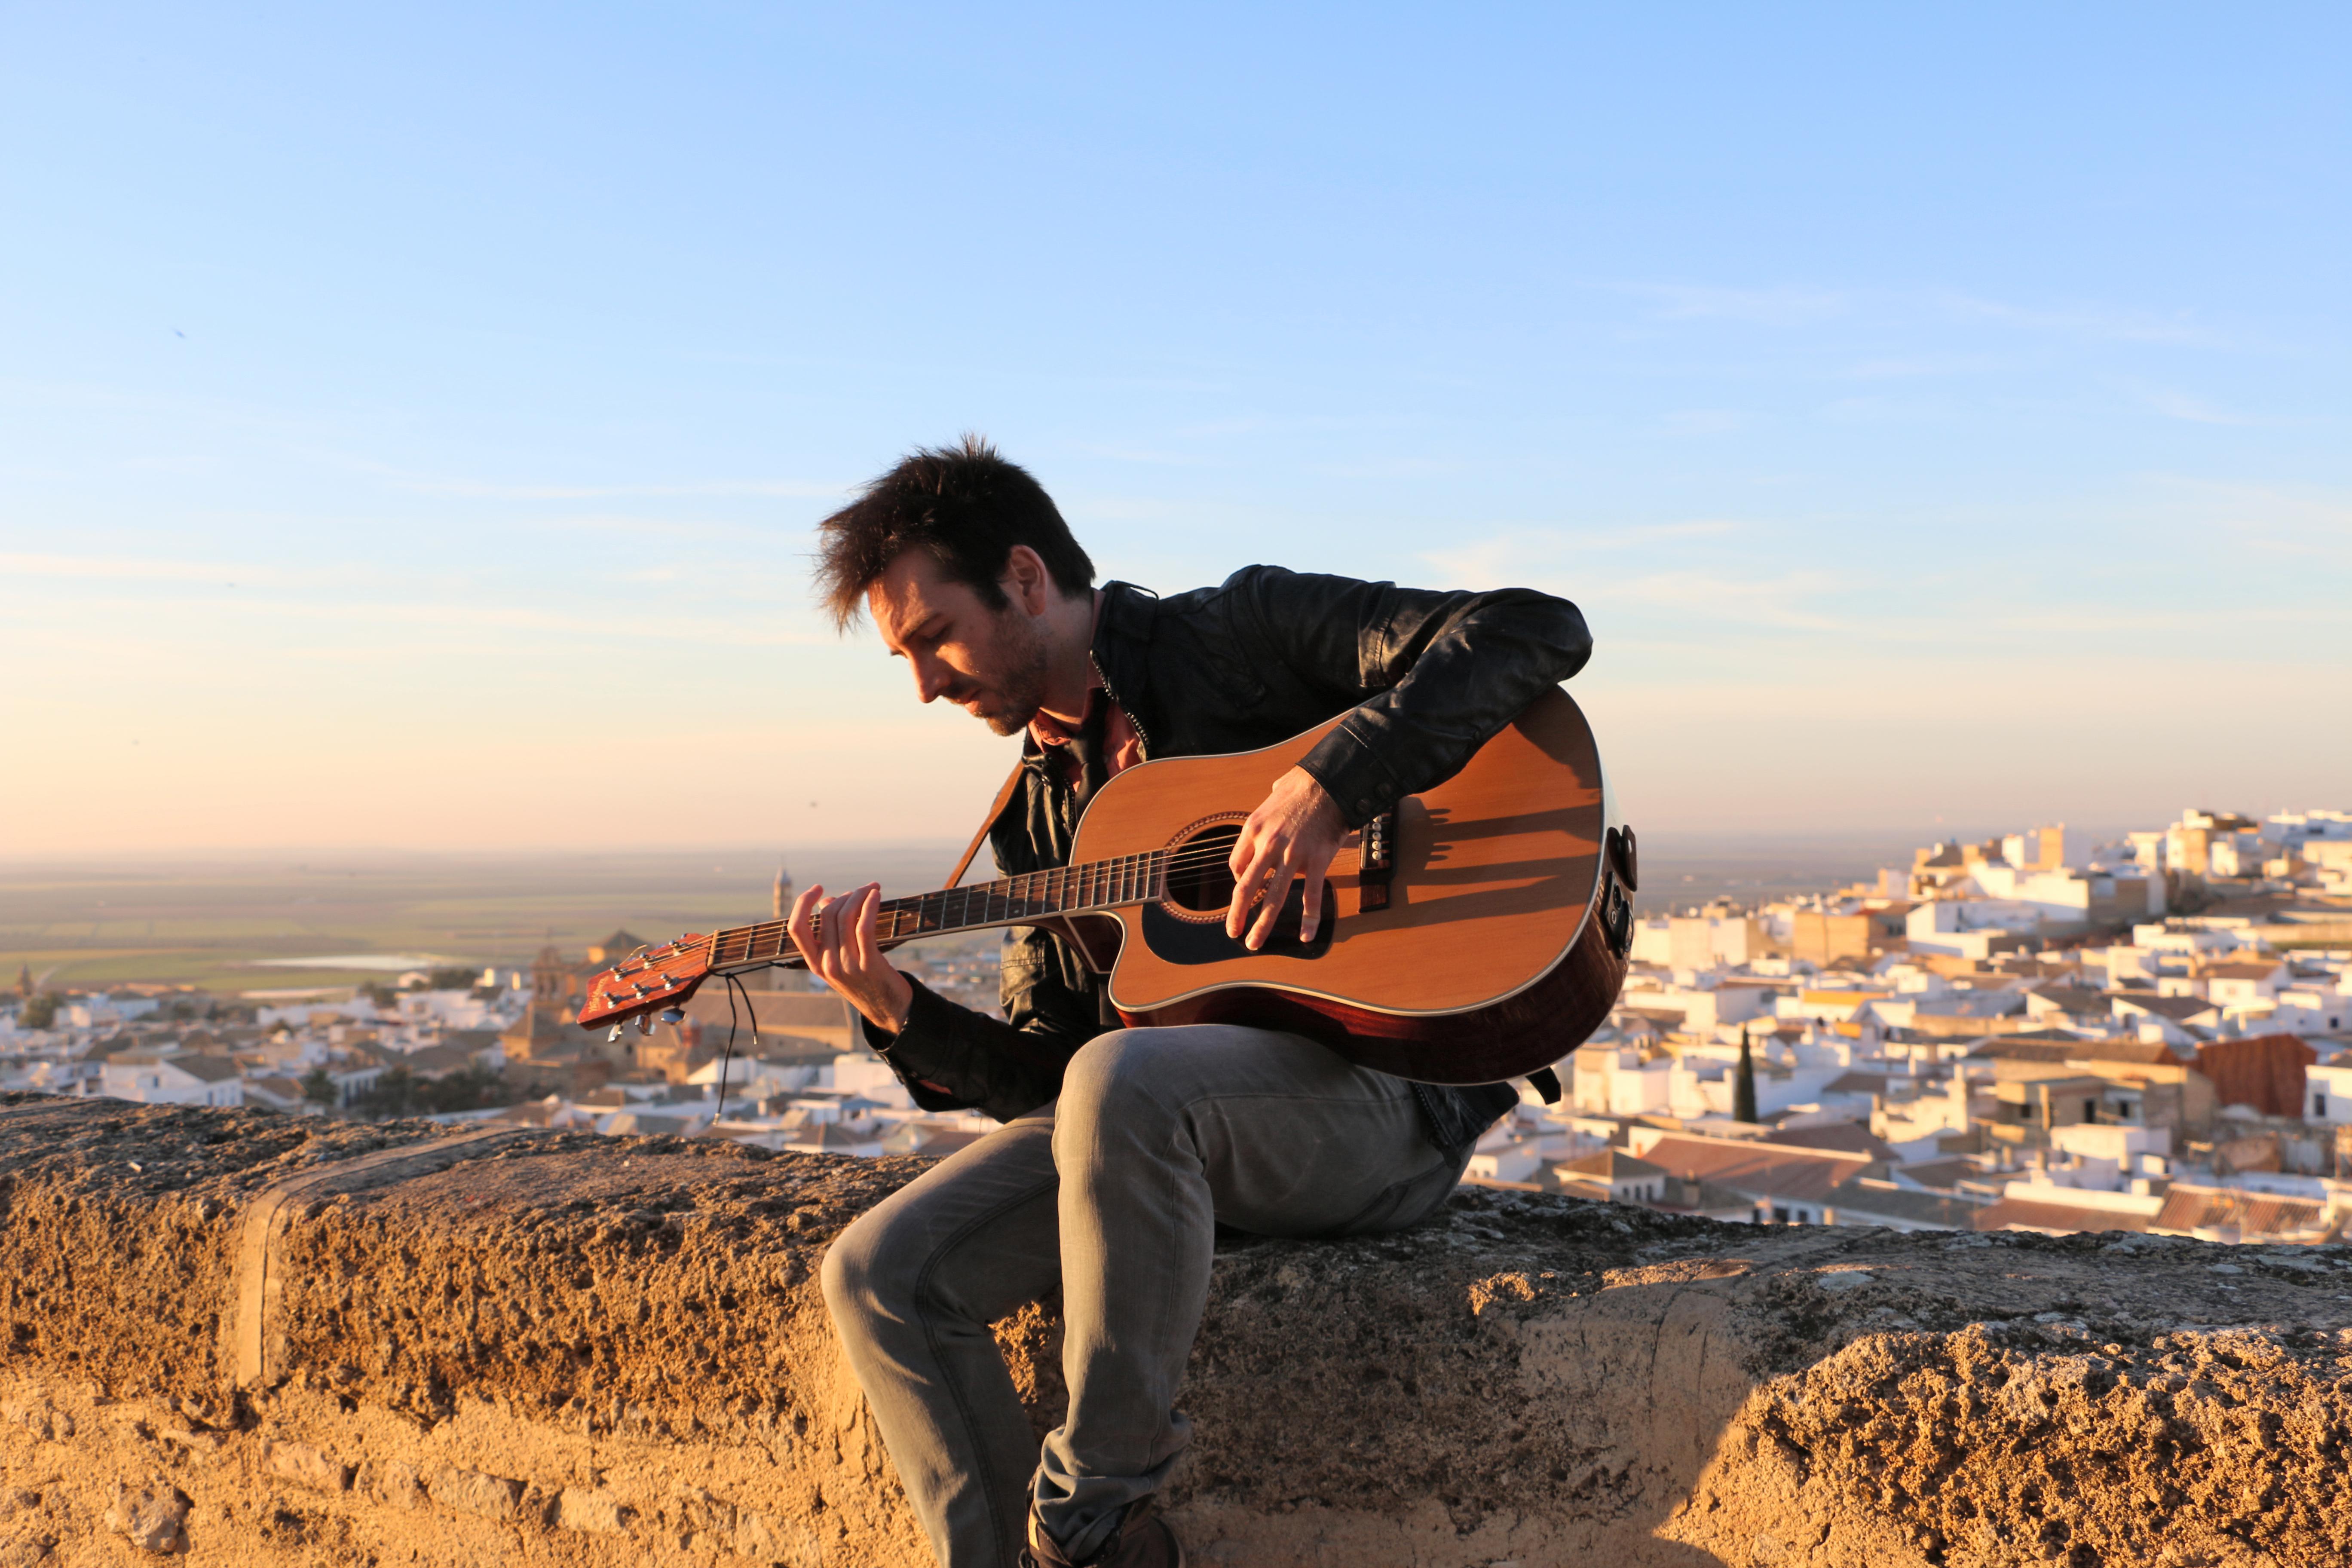 Jose Ruiz tocando la guitarra